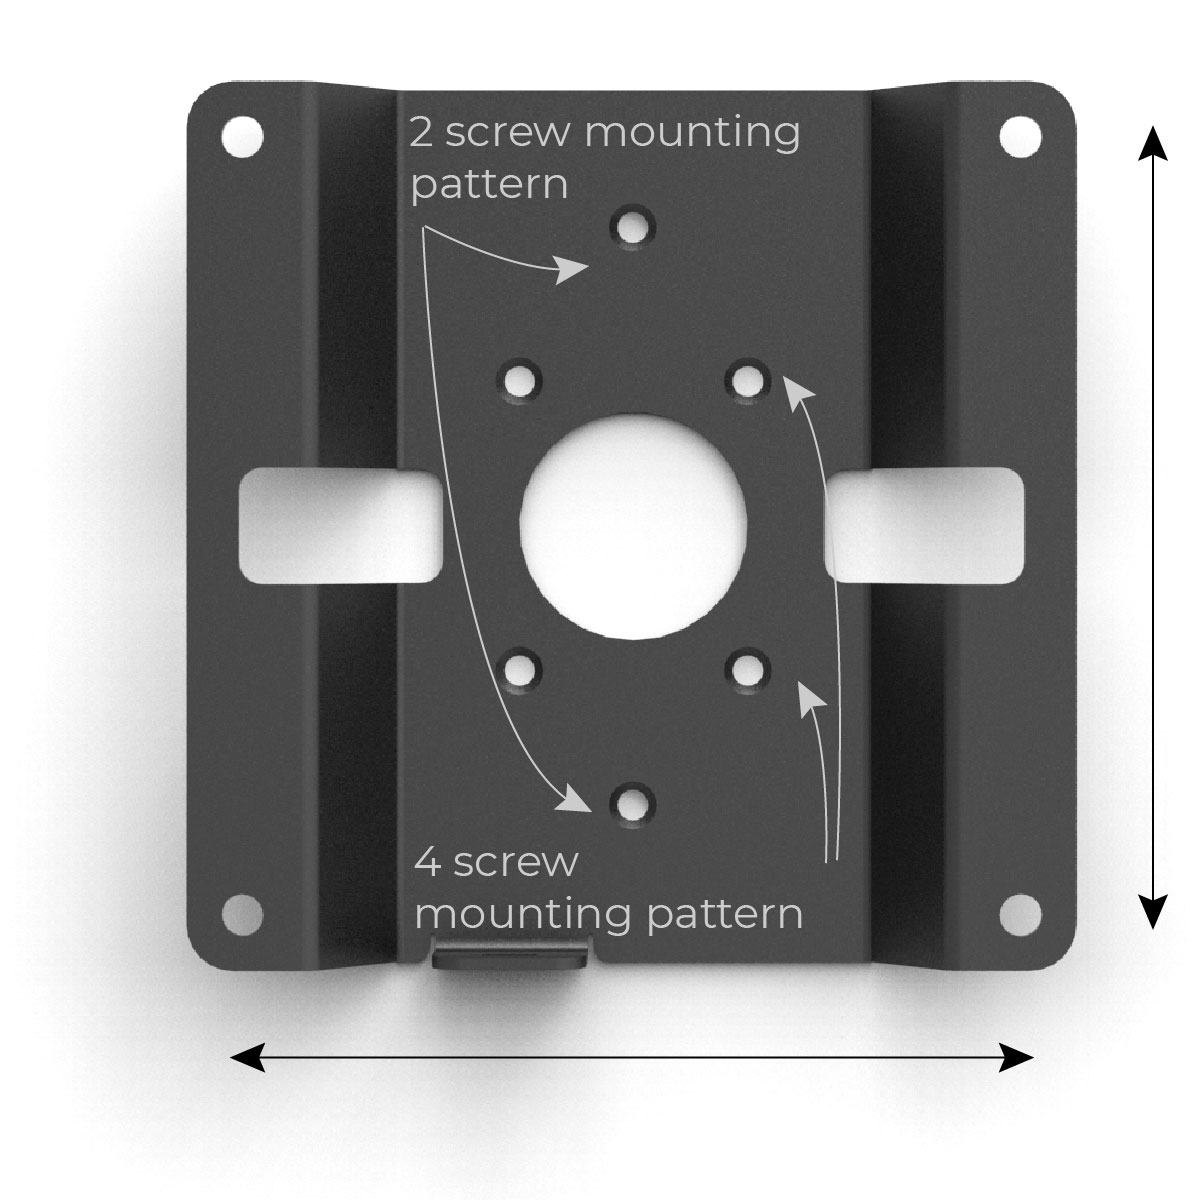 100x100 VESA mount